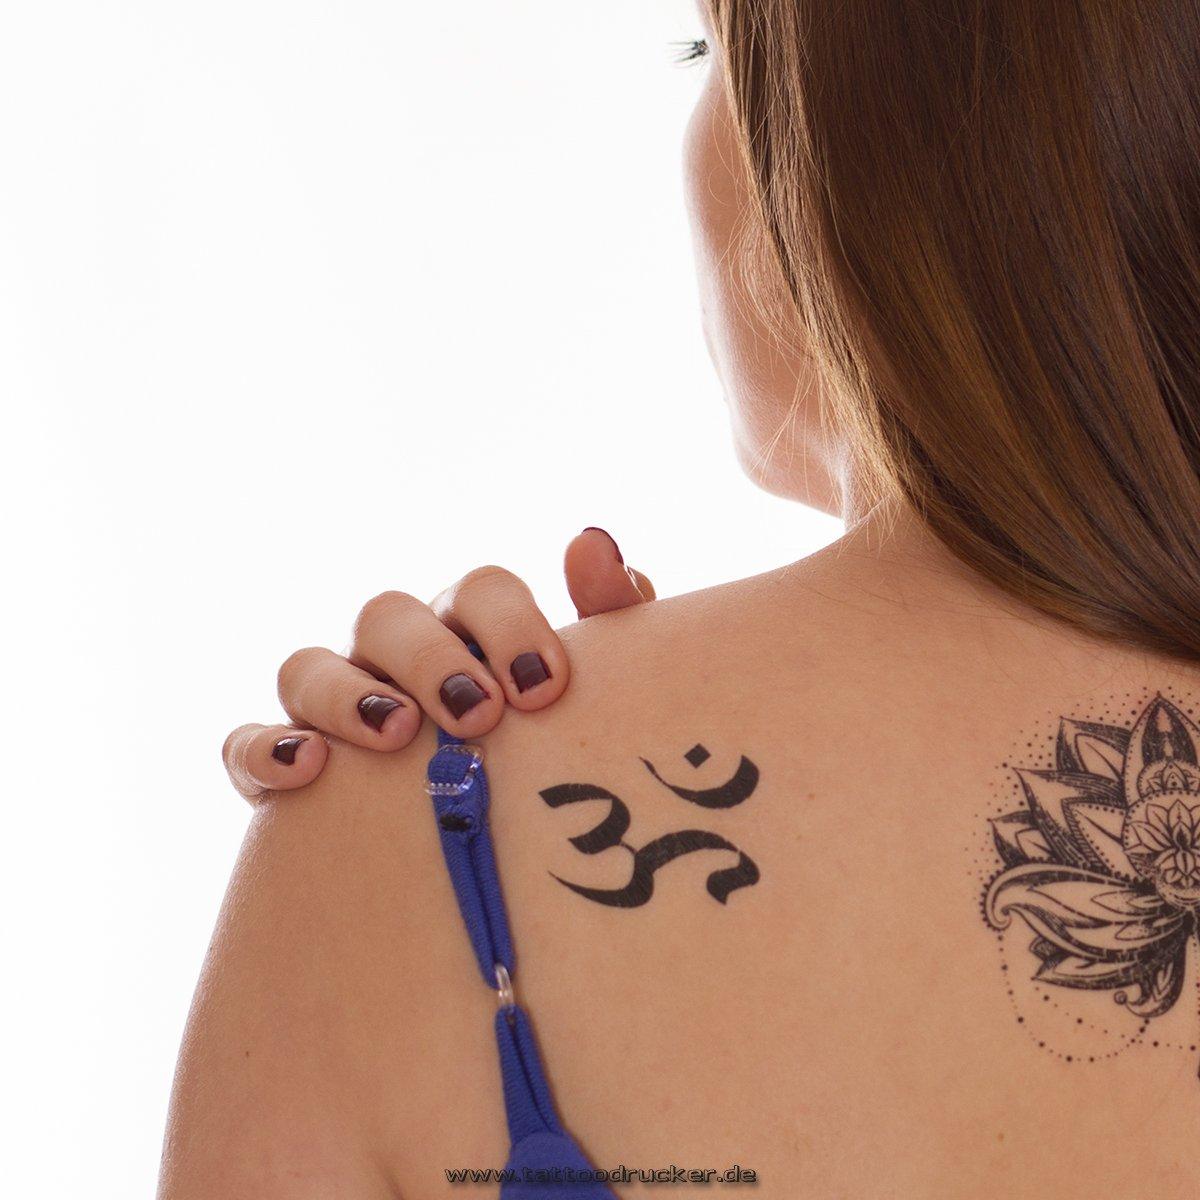 Amazon 5 x om tattoo black om aum symbol tattoo shiva buddha amazon 5 x om tattoo black om aum symbol tattoo shiva buddha india 5 toys games buycottarizona Image collections